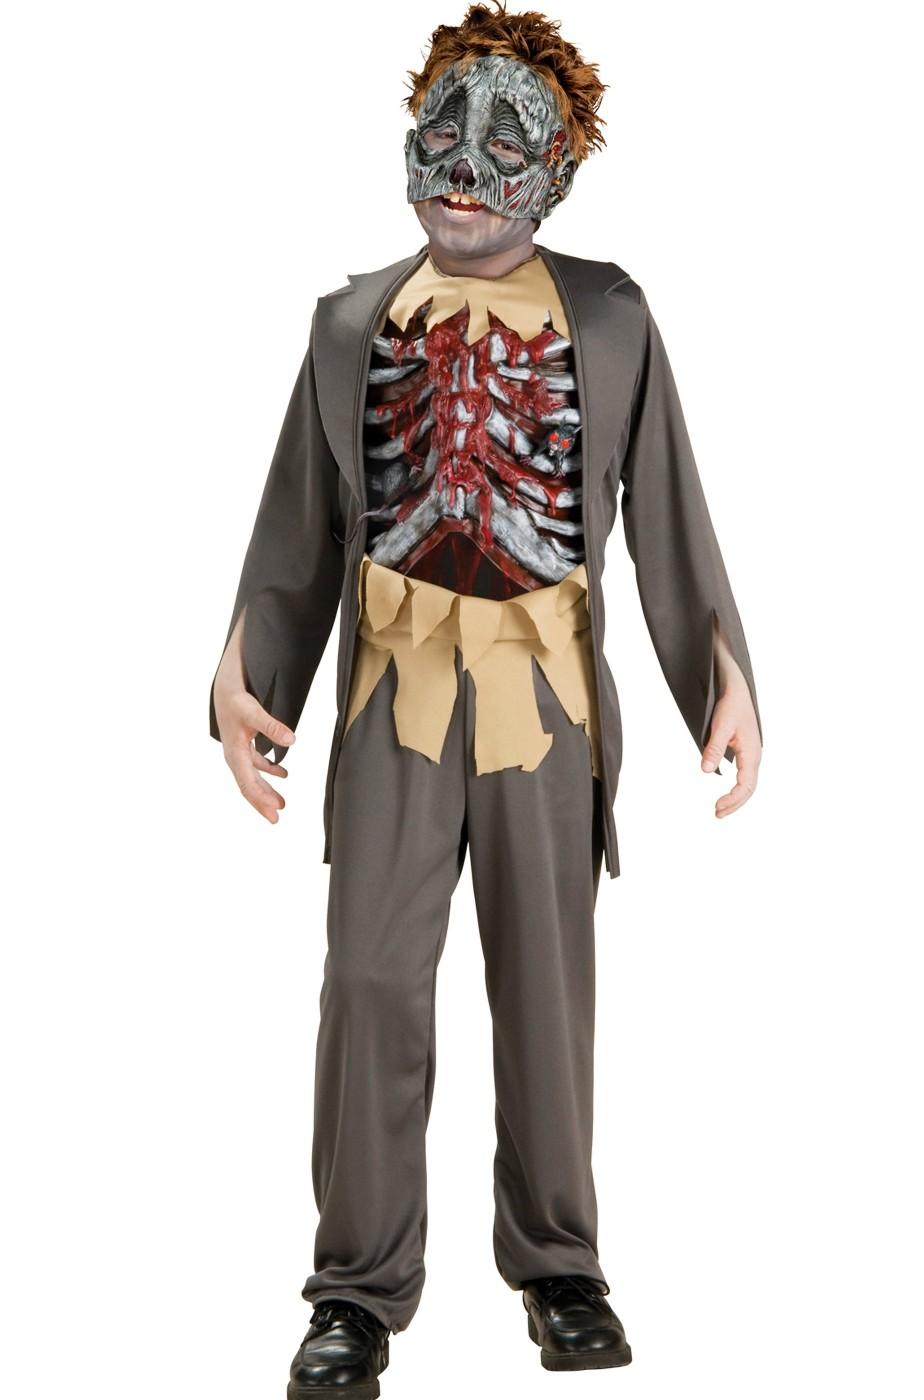 Zombie Cosplay Costume Bambino Scheletro Fancy Dress Halloween Carnevale